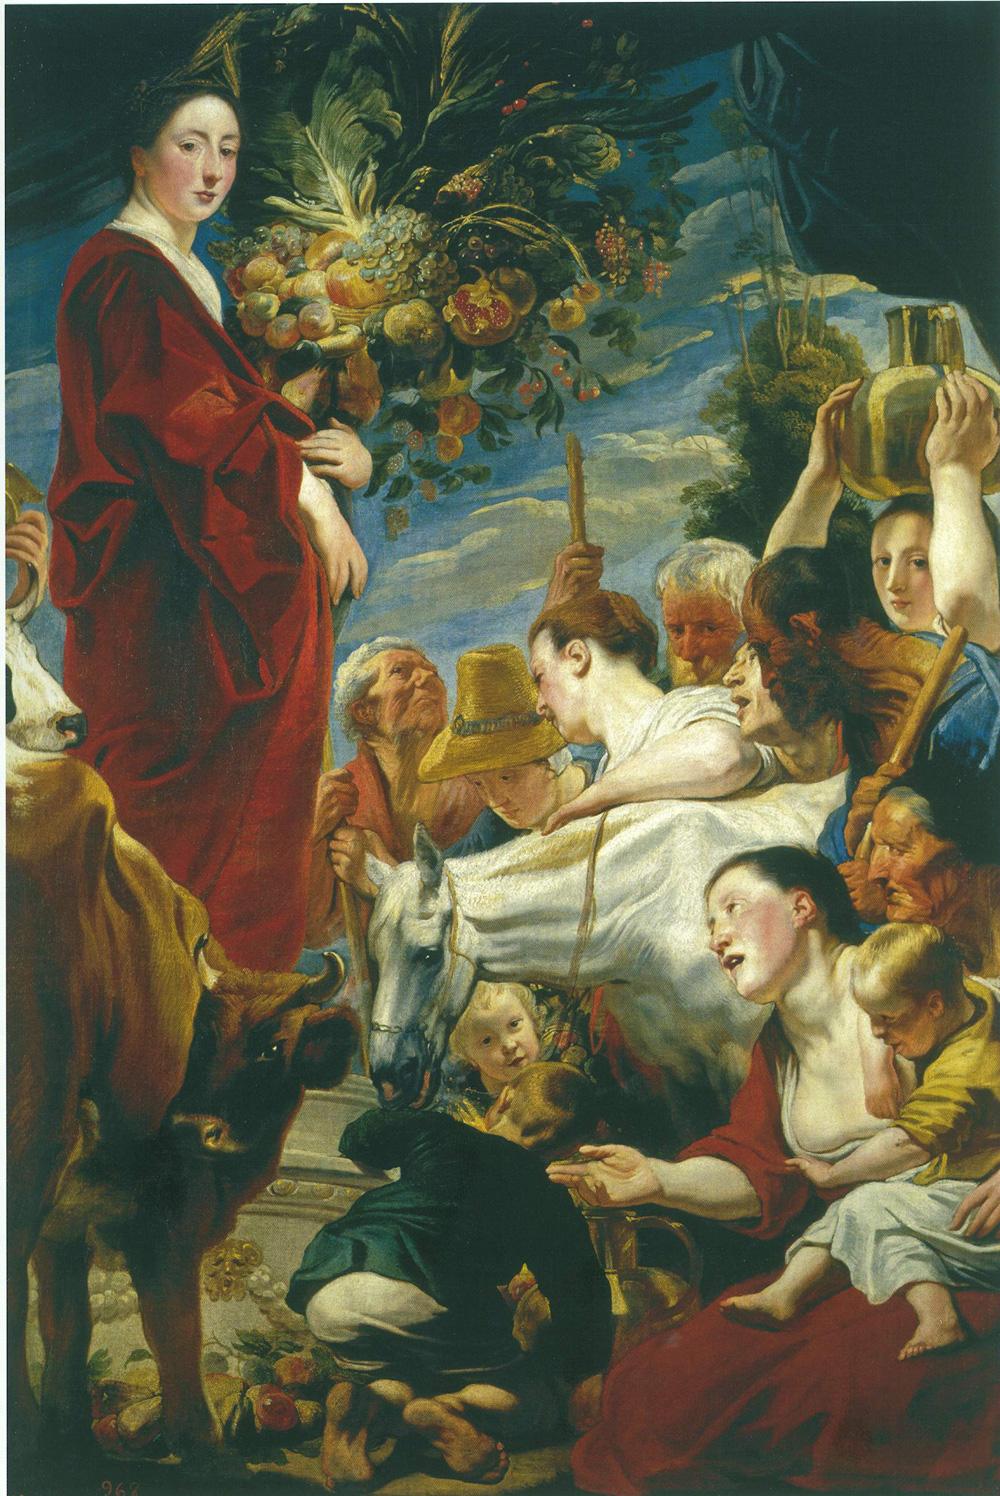 Jacob Jordaens (1593-1678), Homage to Ceres, ca. 1624-25© Museo Nacional del Prado, Madrid